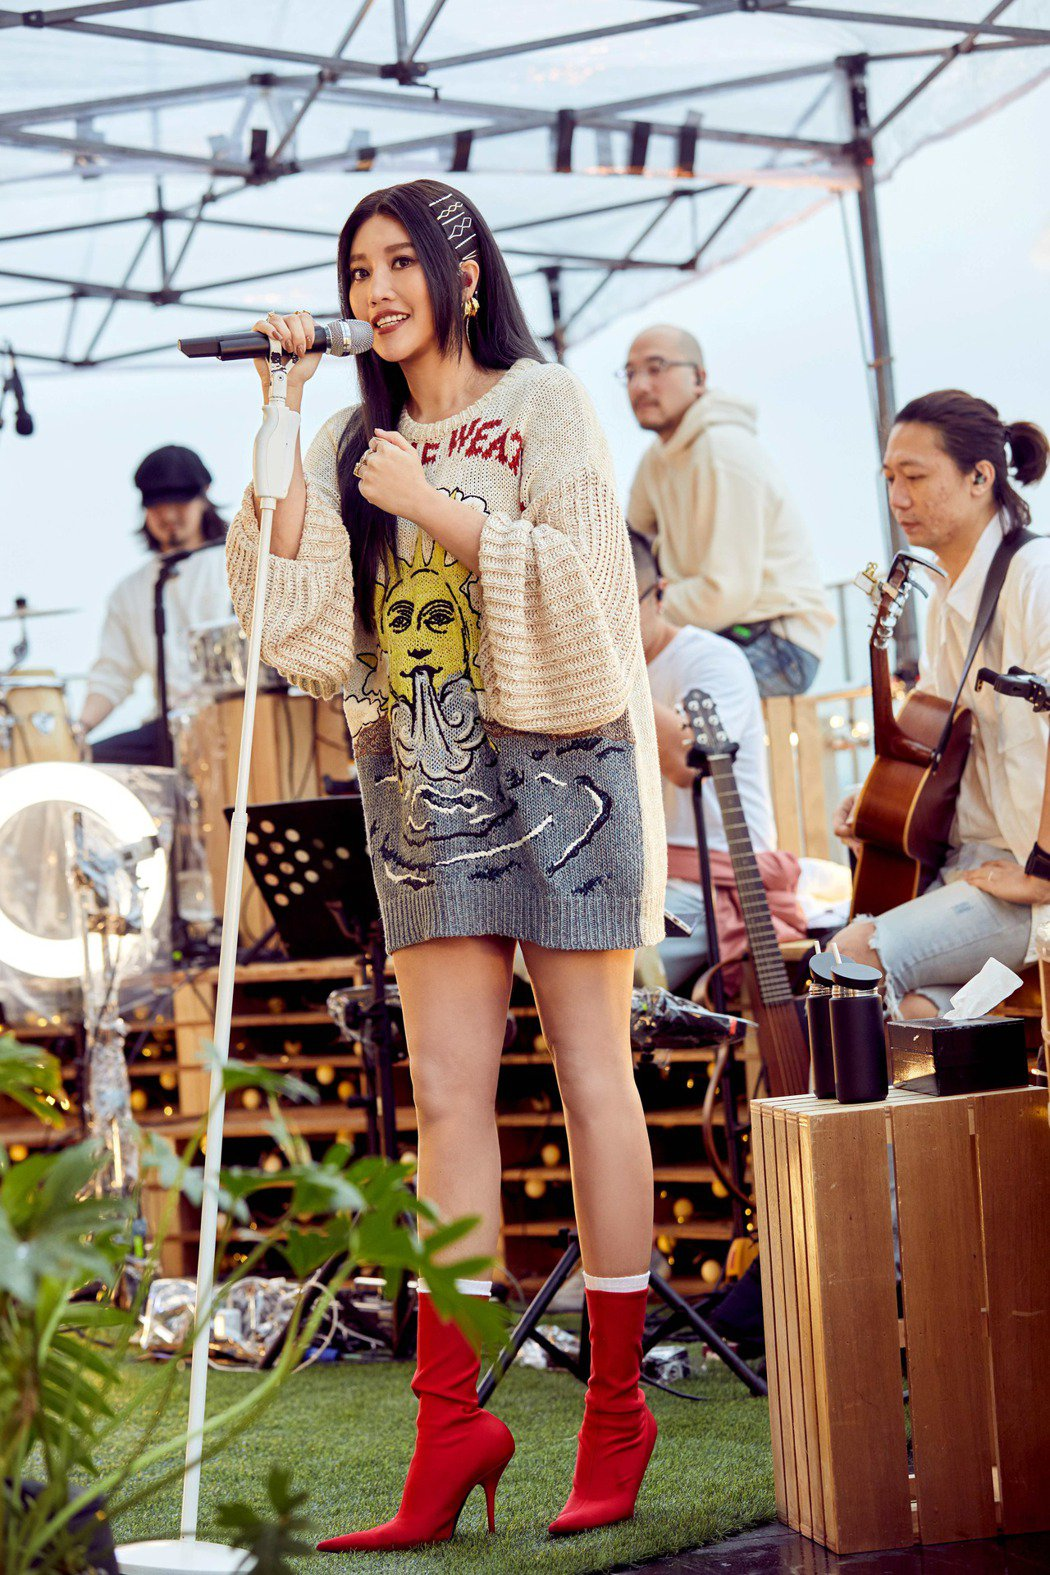 A-Lin今晚舉辦線上音樂會,首次挑戰演唱會規模卻現場「零觀眾」。圖/TME L